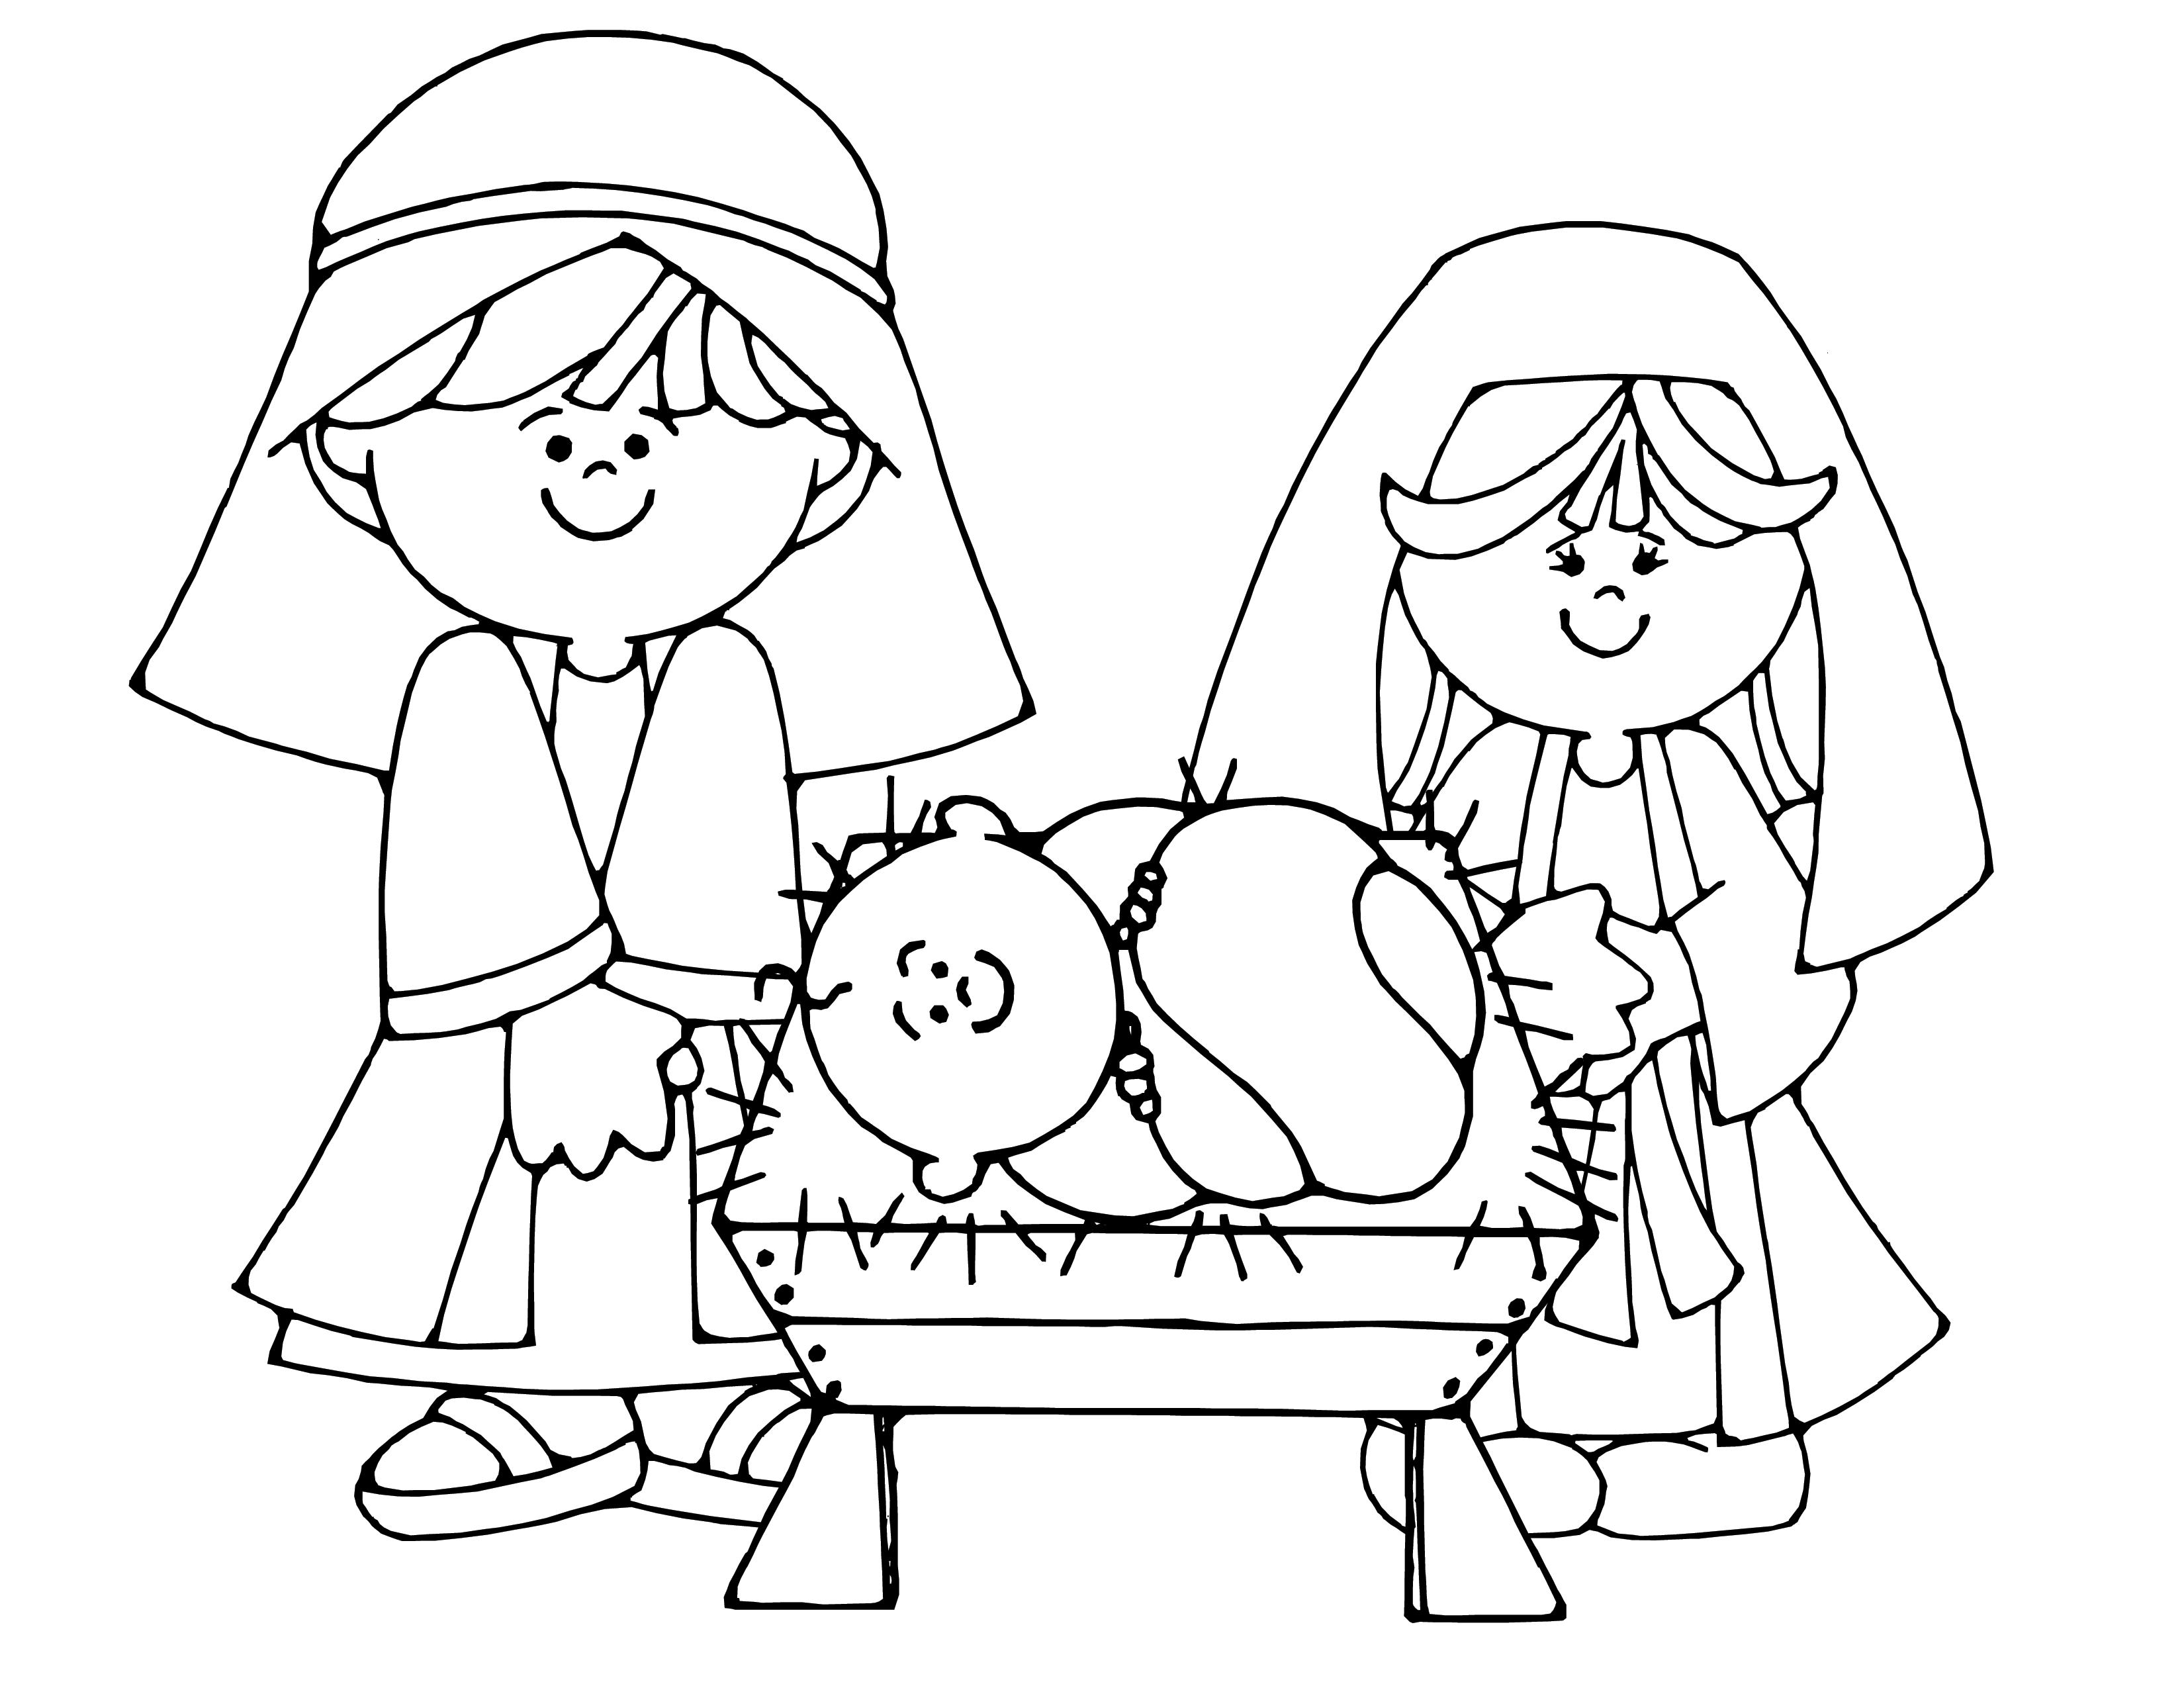 coloring page nativity scene nativity coloring pages coloringpagesabccom scene page nativity coloring